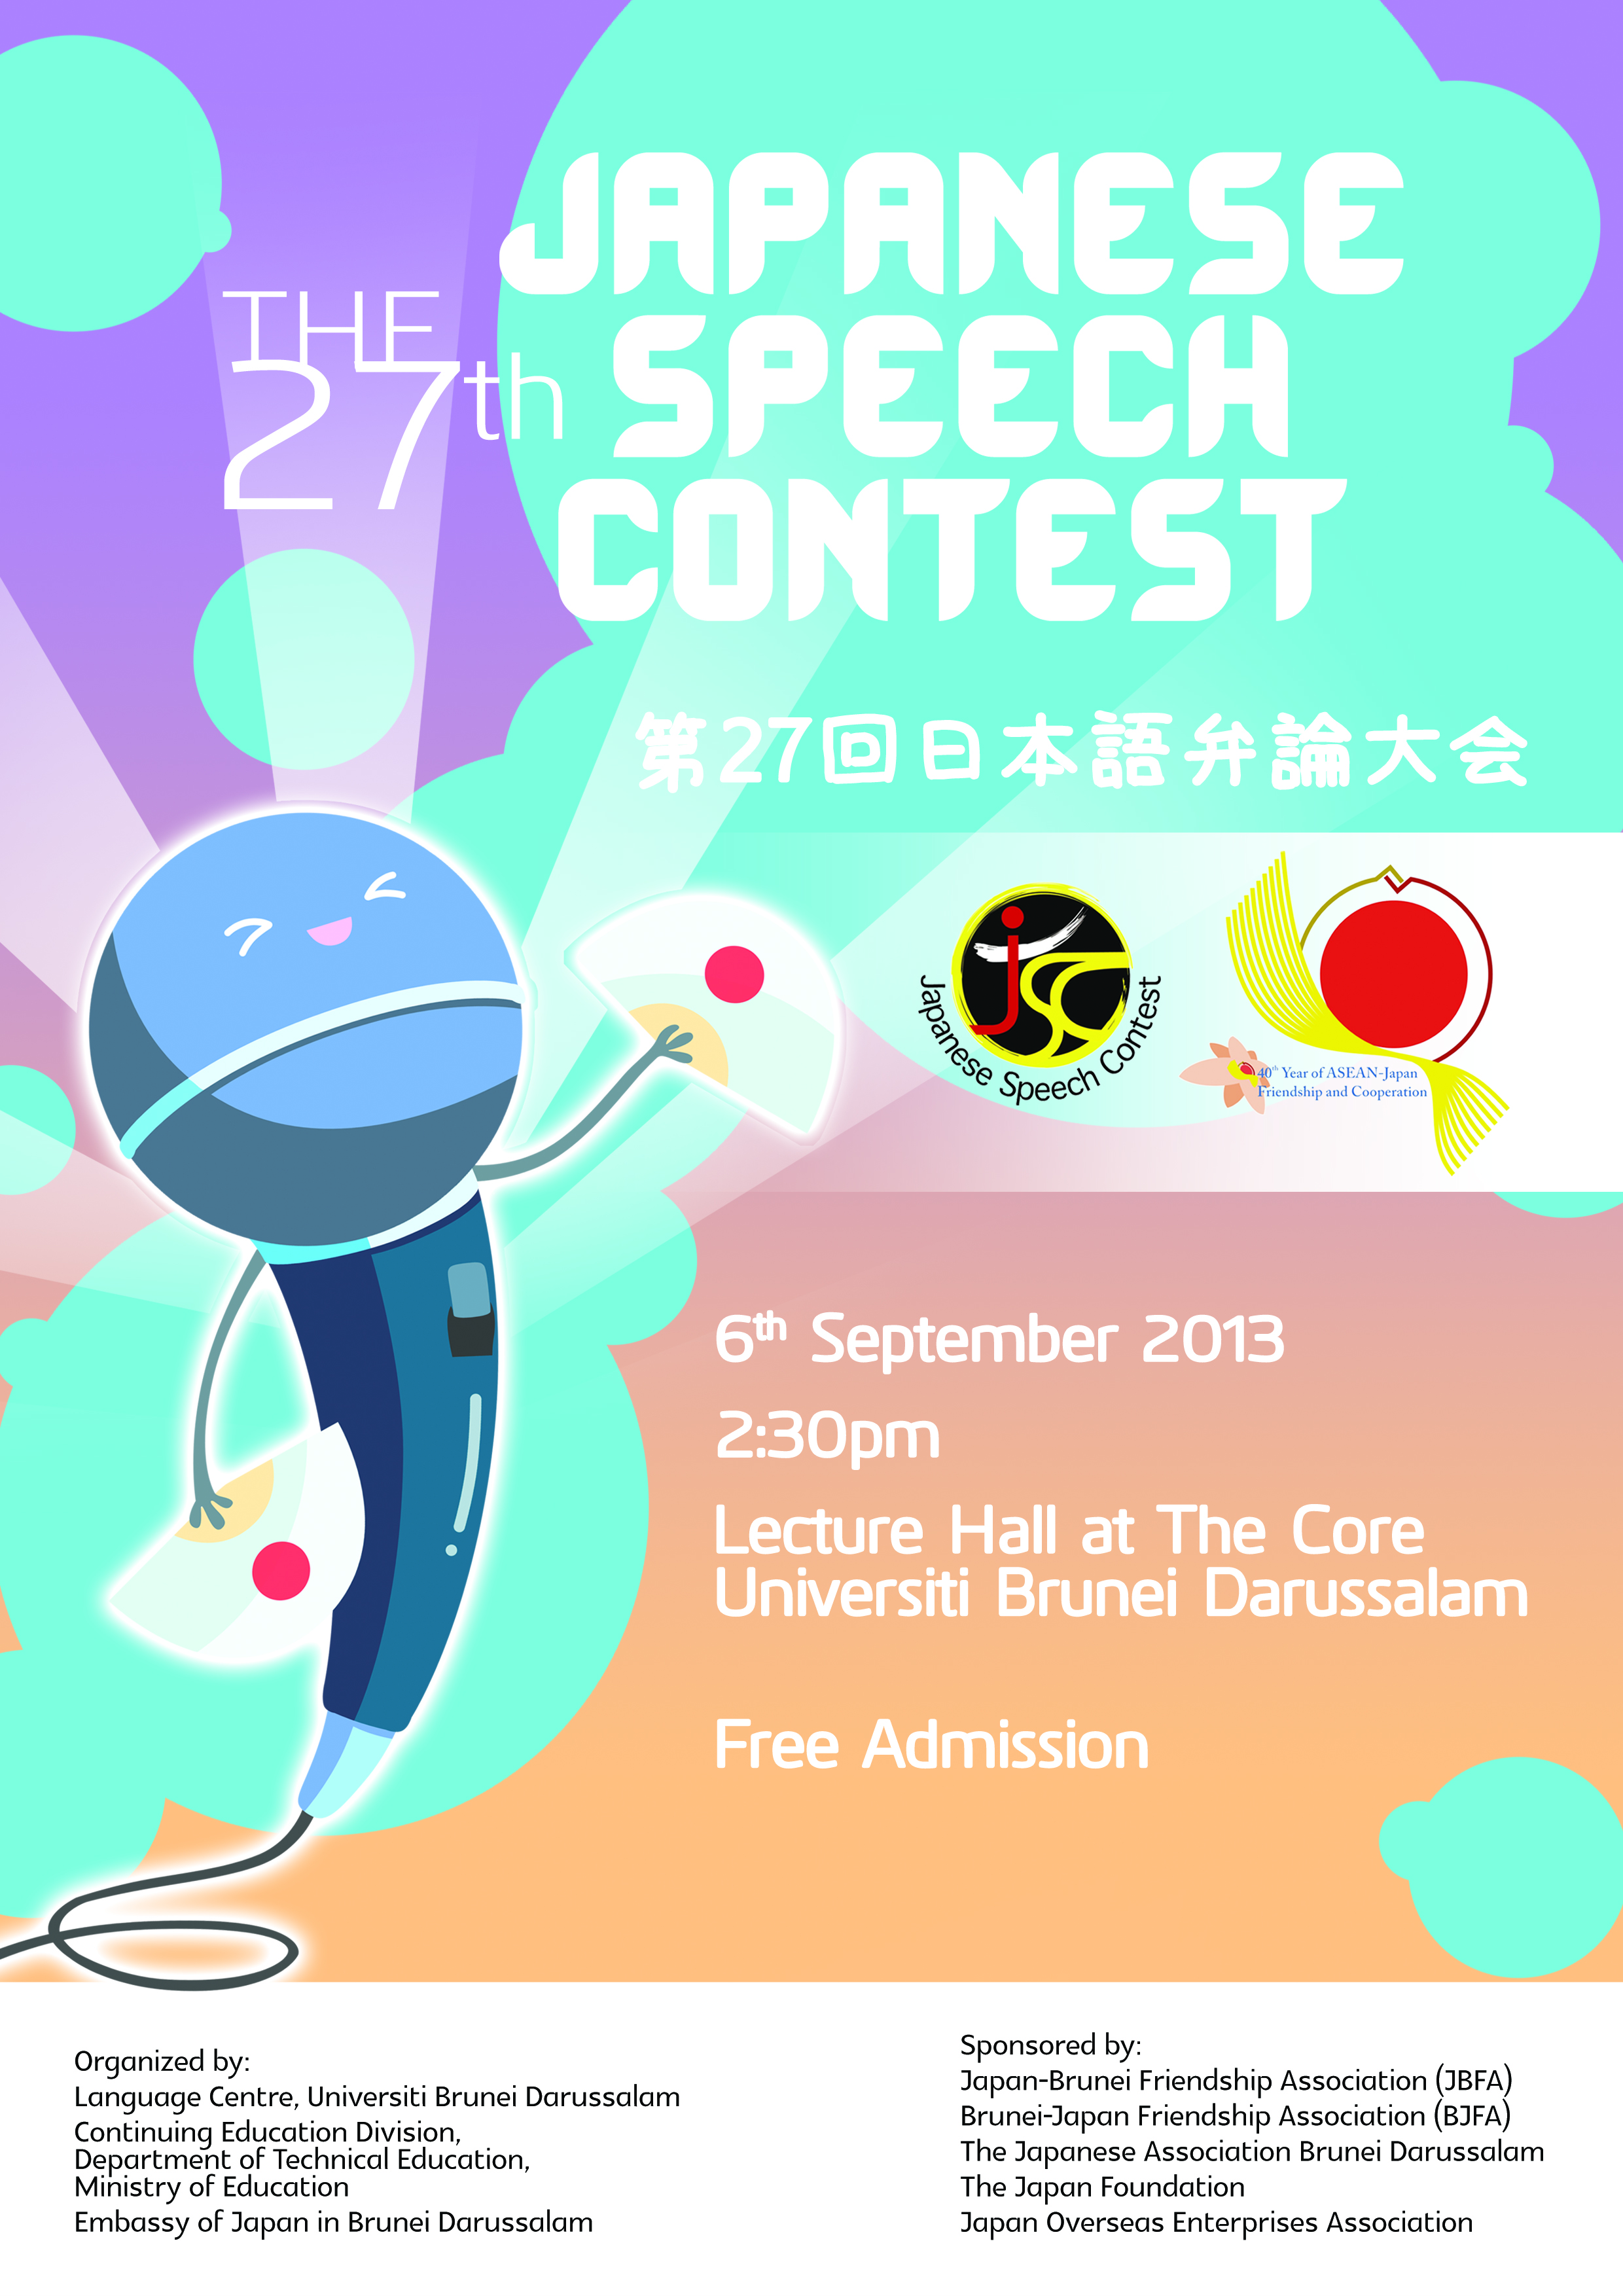 27th Annual Japanese Speech Contest | Brunei Association of Japan Alumni